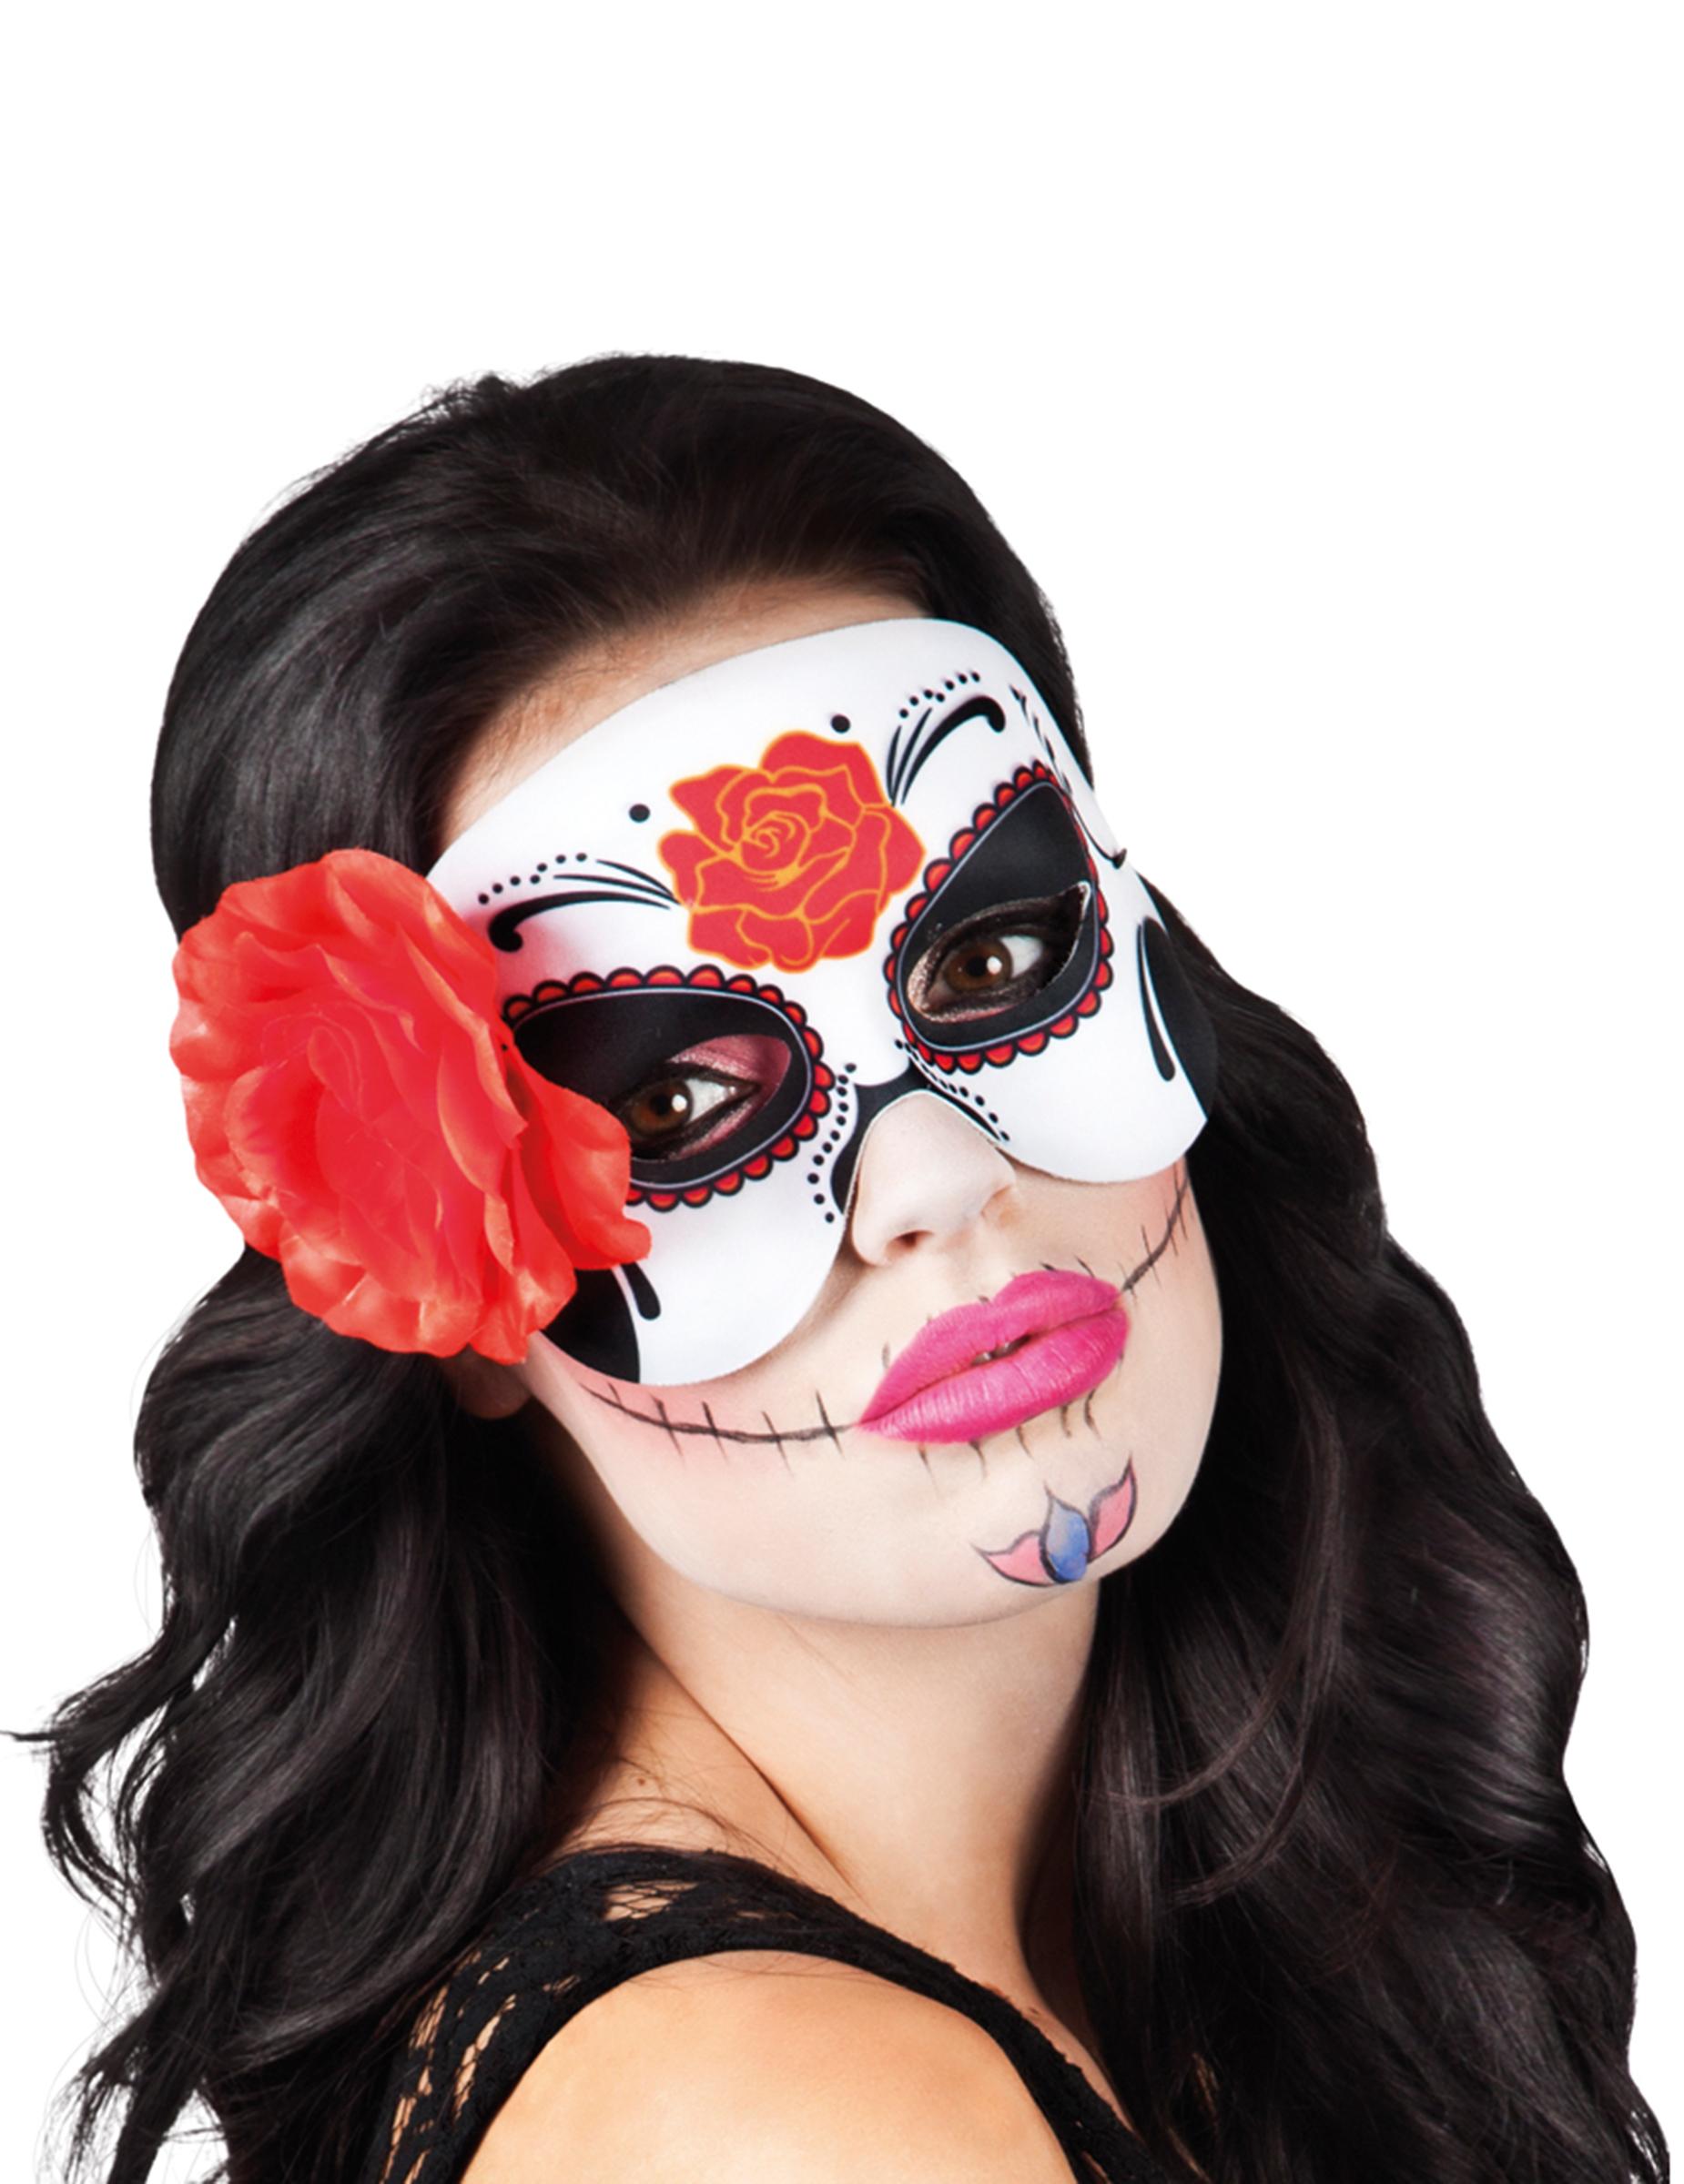 Maschera con de vestiti muertos rosa Dia di e rossa Maschere los qUdrqfx